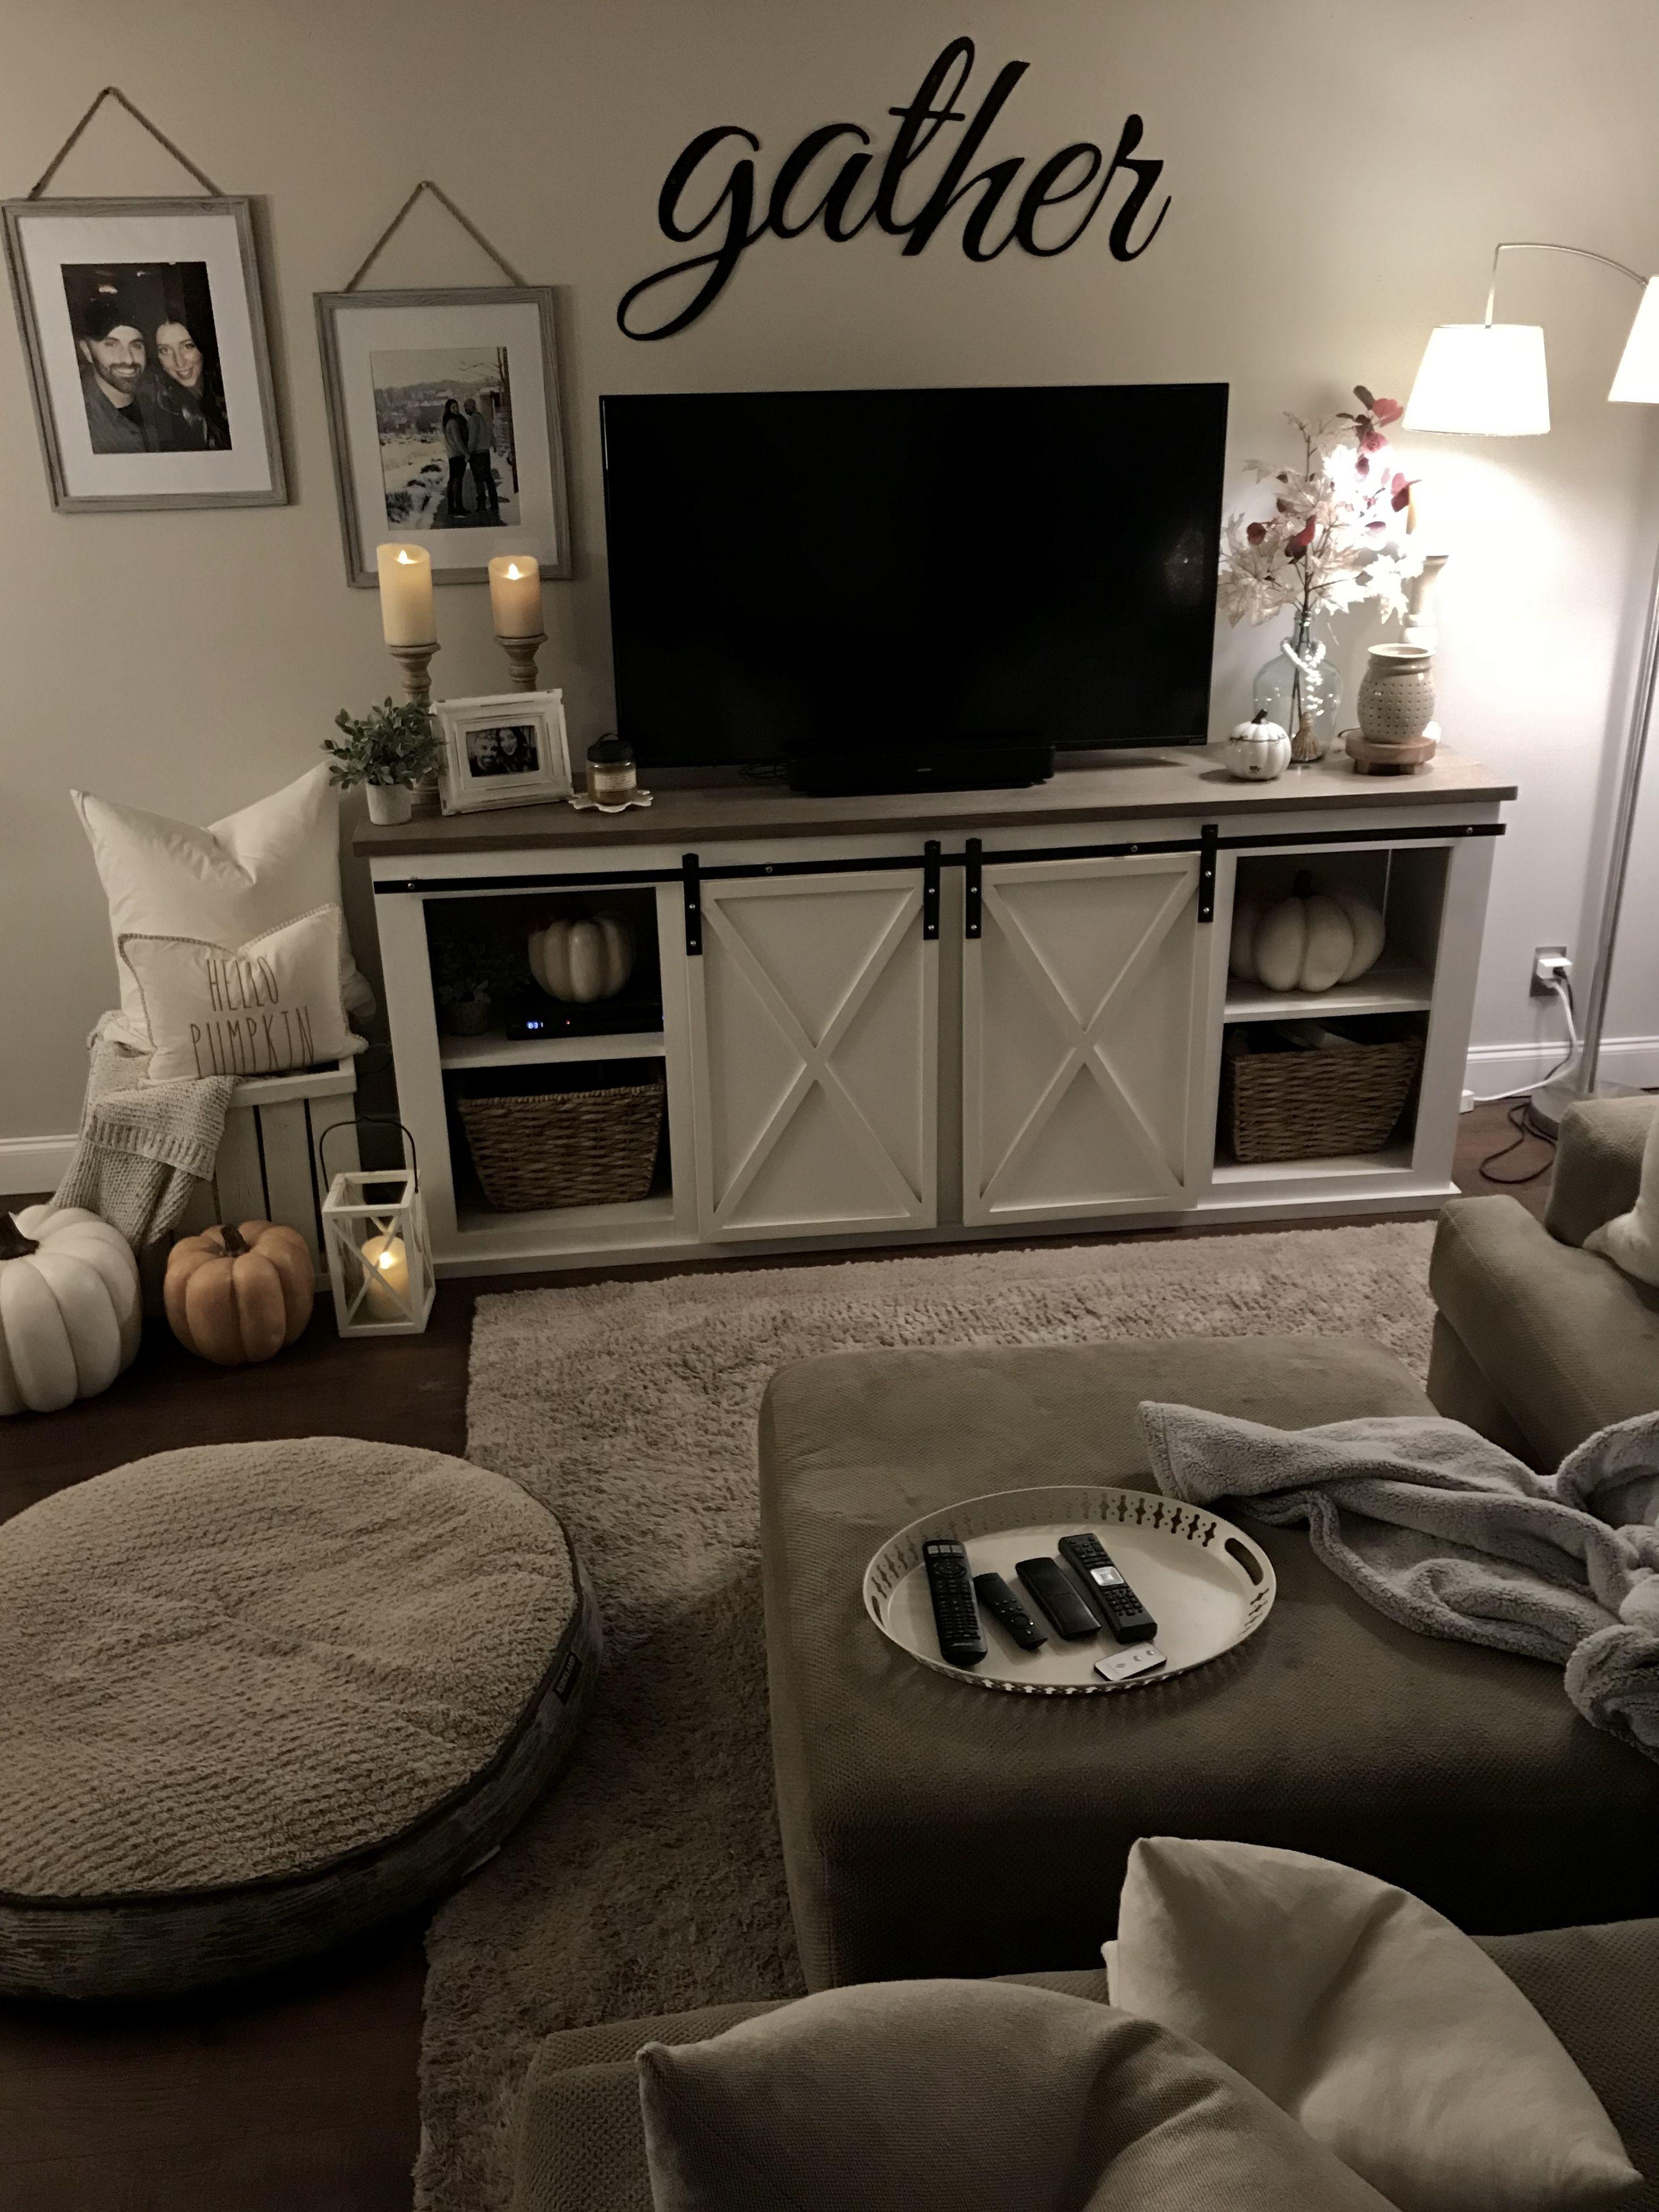 Cozy Living Room Living Room Tv Stand Living Room Decor Apartment Farm House Living Room